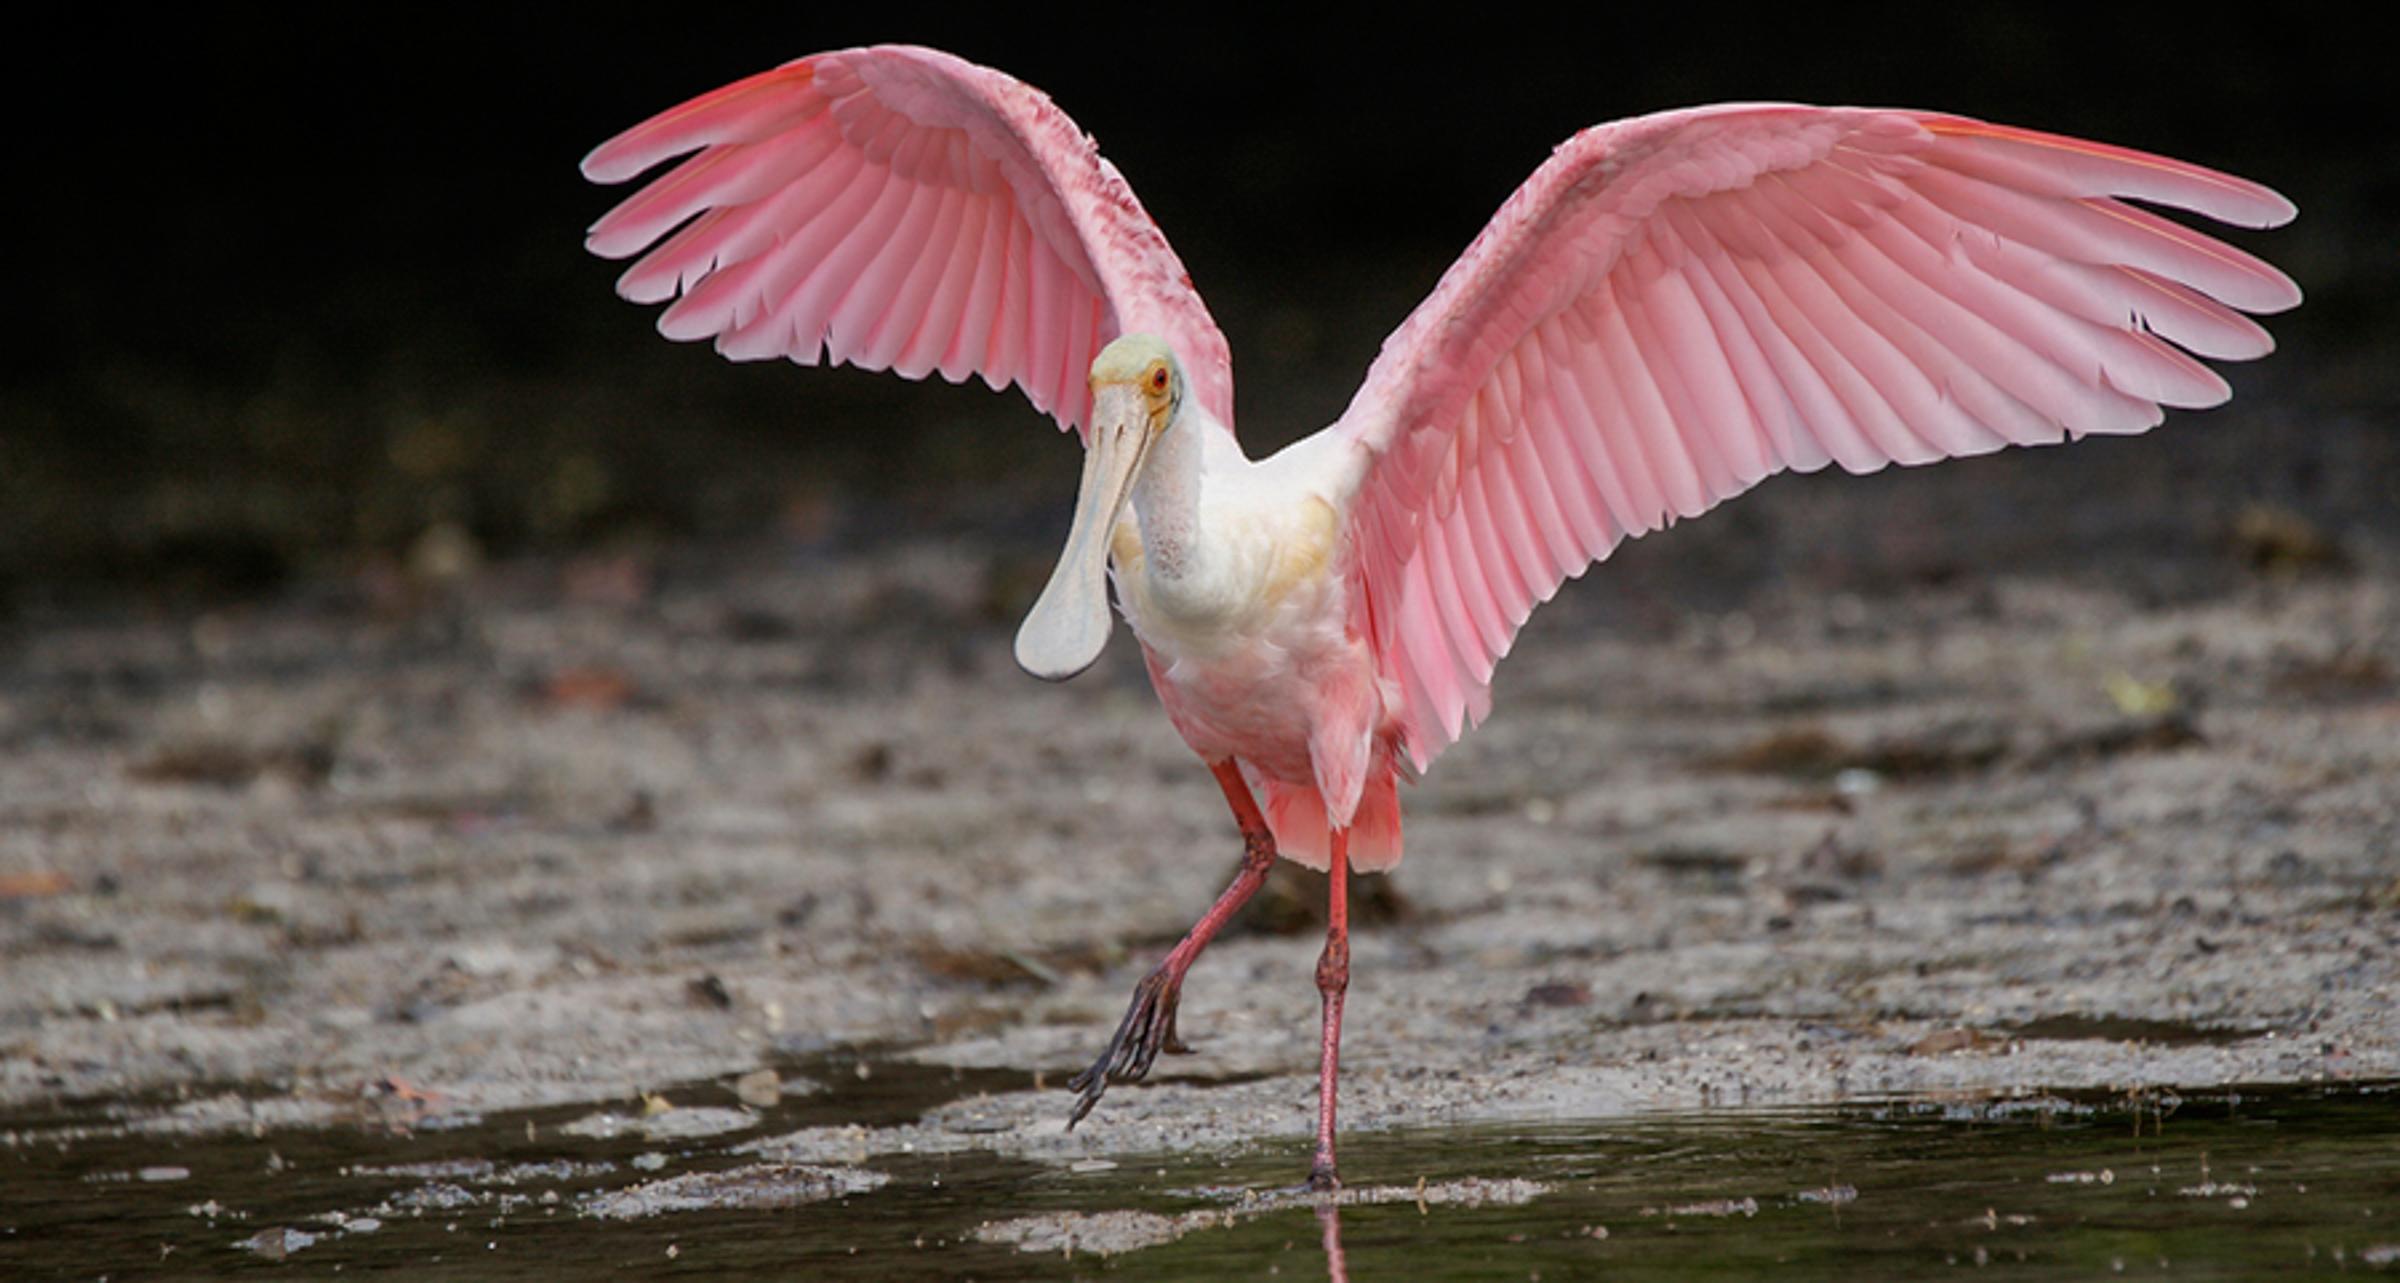 Roseate Spoonbill. Photo: Paul Brooke / Audubon Photography Awards.